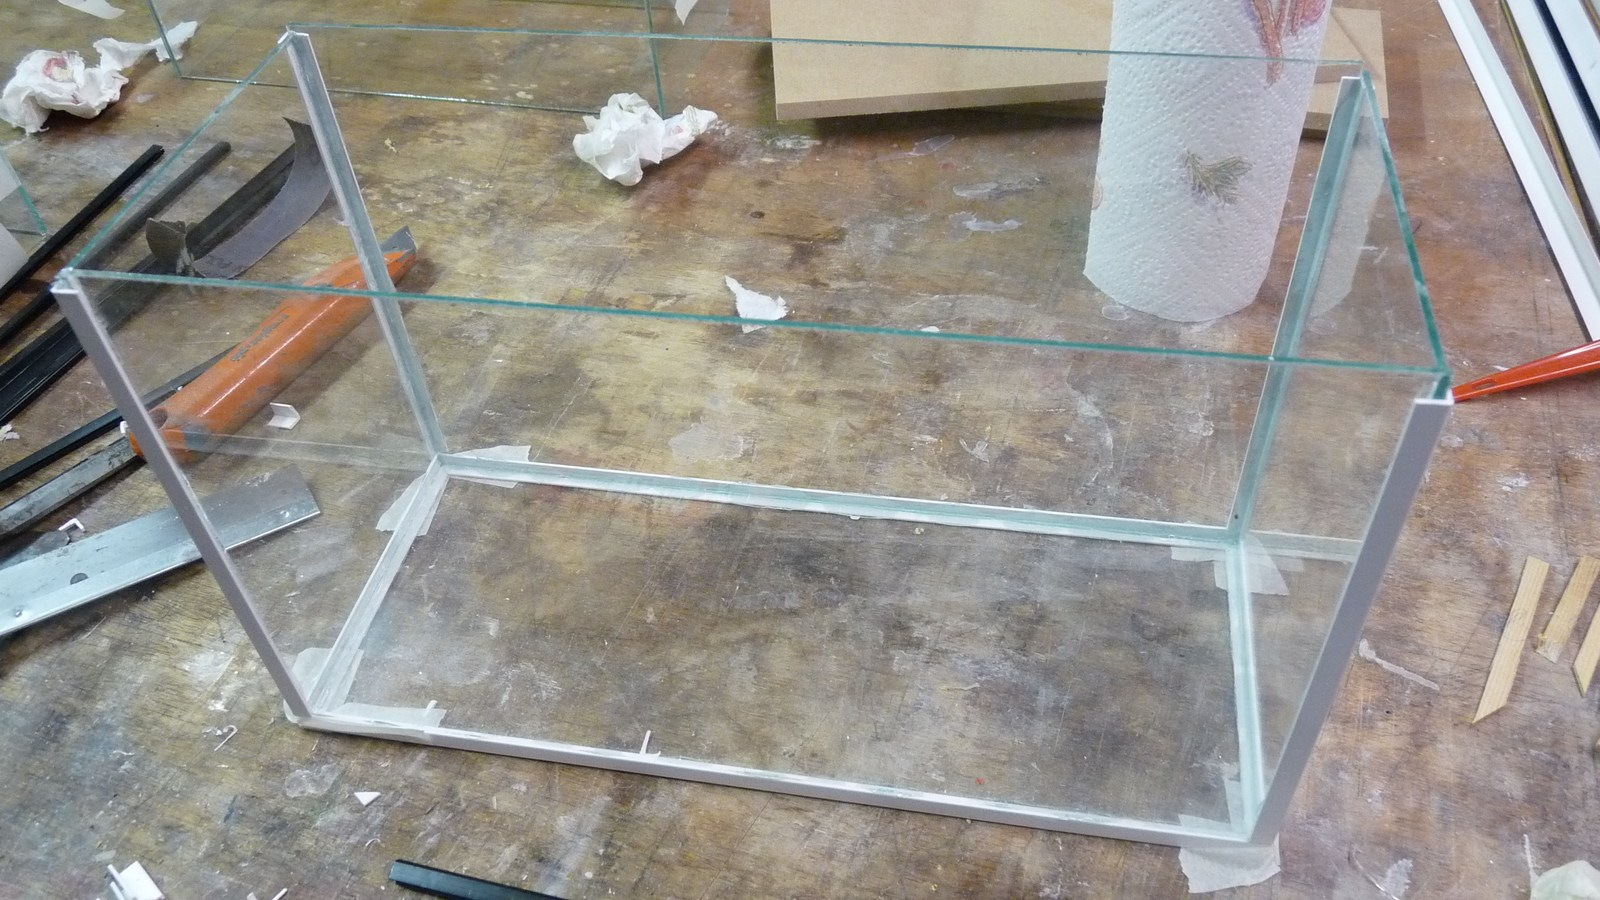 Fabriquer ses propres vitrines en verre 17071907270023134915156555